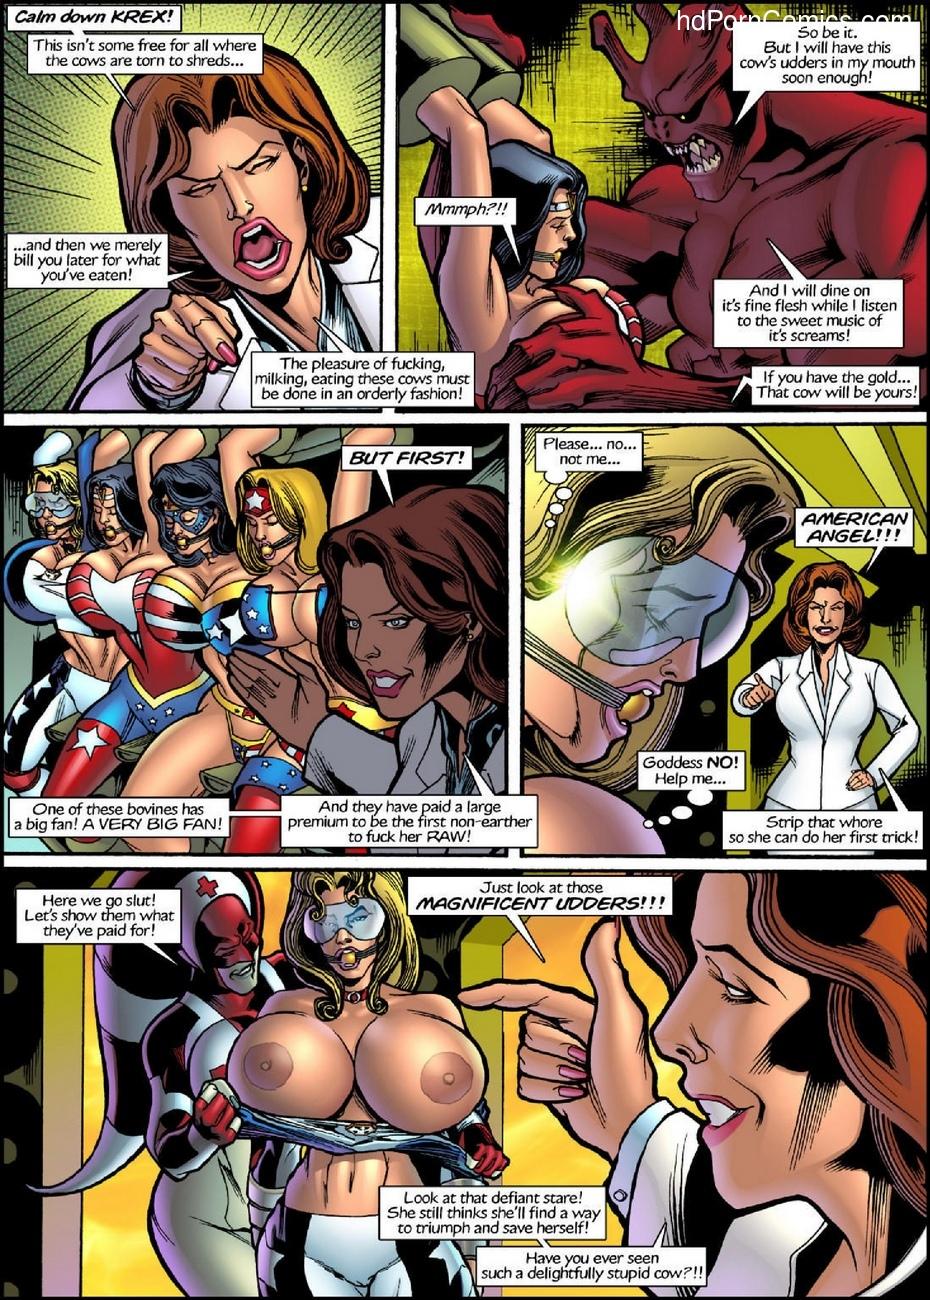 Freedom Stars - Cattle Call 1 17 free sex comic